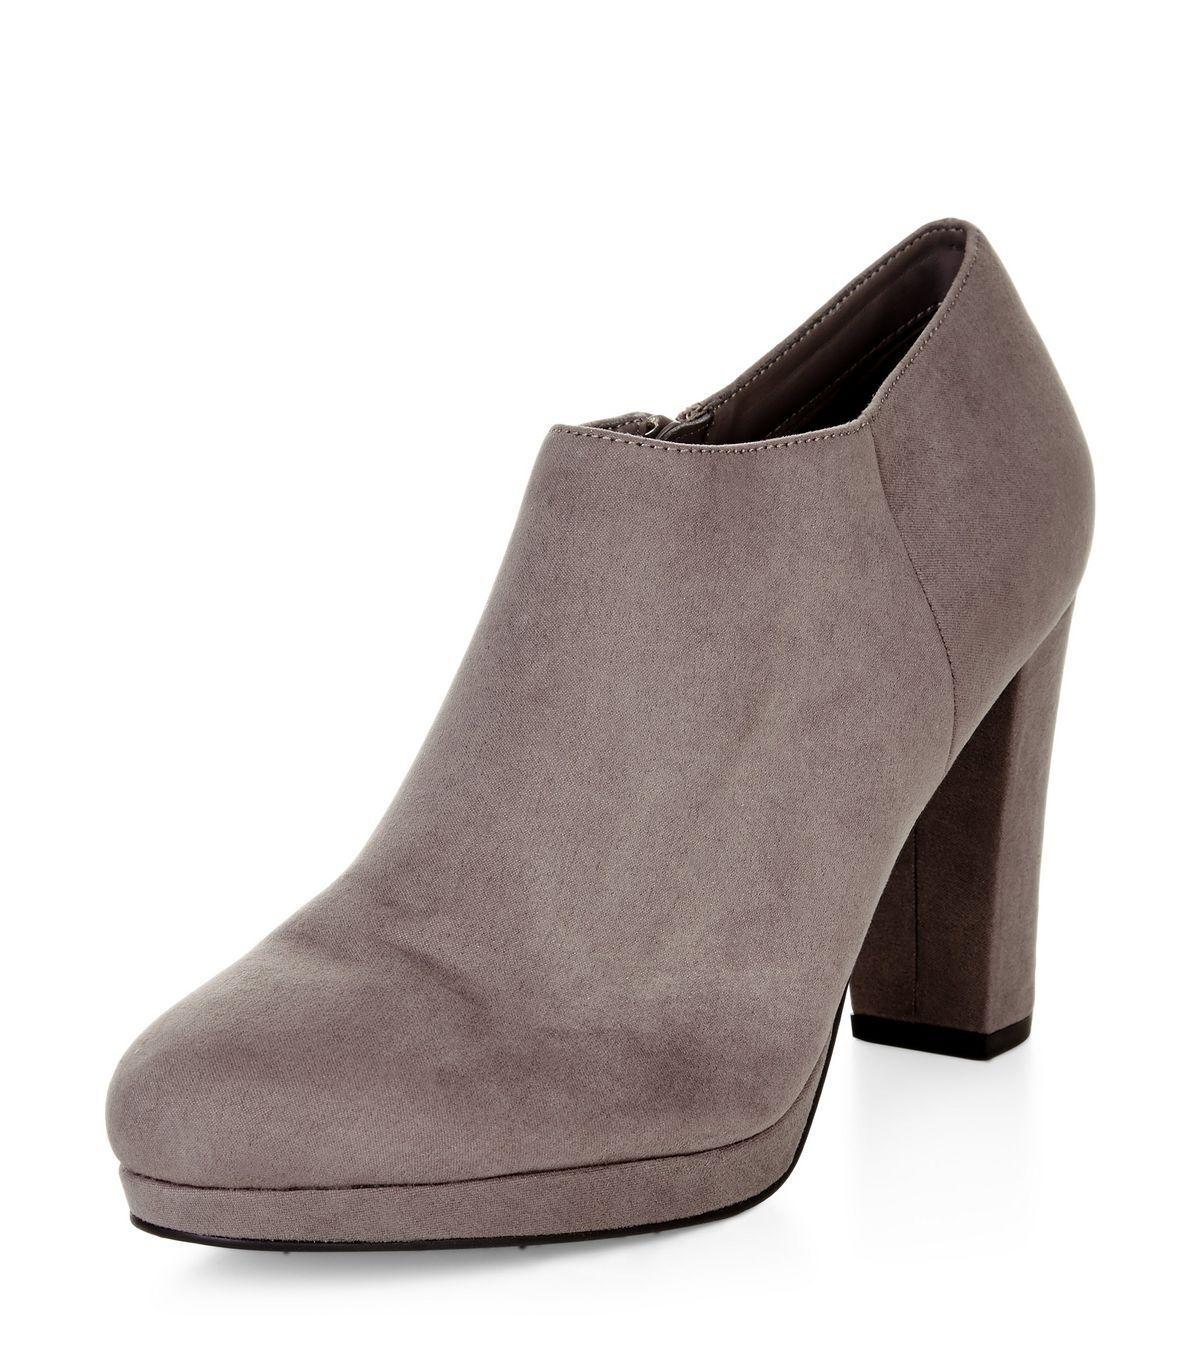 New Heels Look Grau Suedette Block Heels New Schuhe Stiefel Größe 5 Brand New Must Have 9f6901